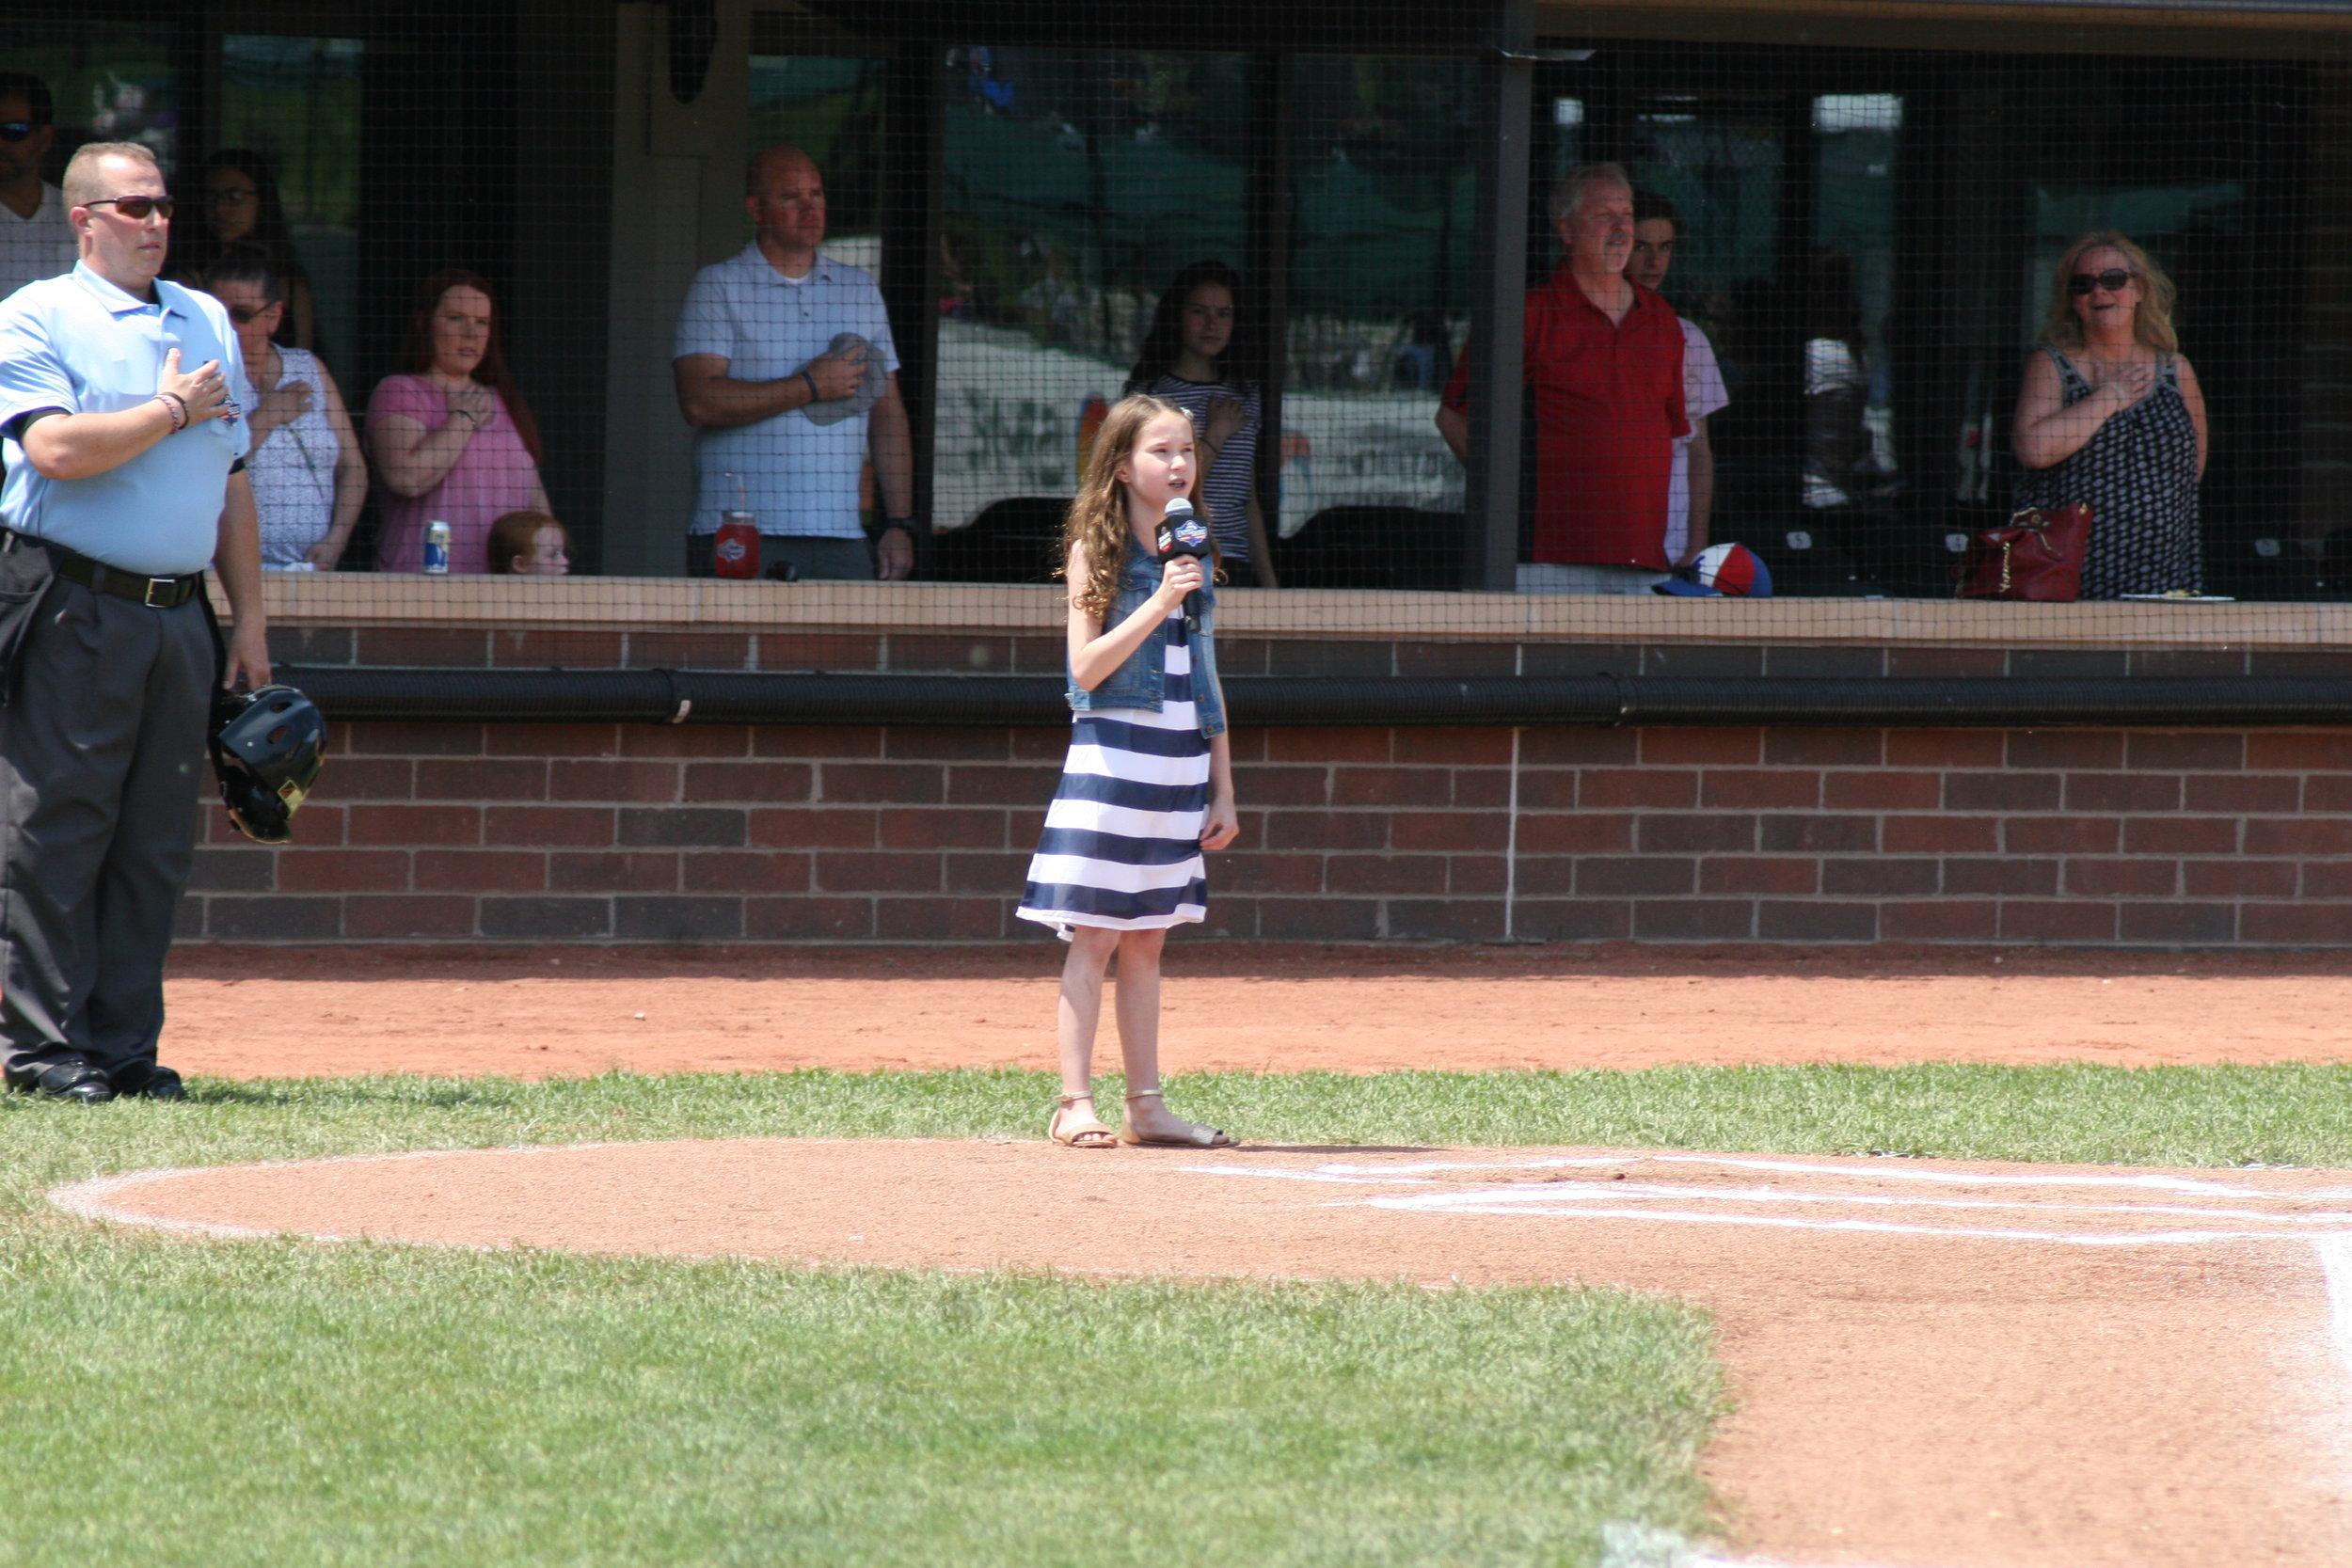 Memorial Day 2018 at Jimmy John Field (2) Brie National Anthem.JPG